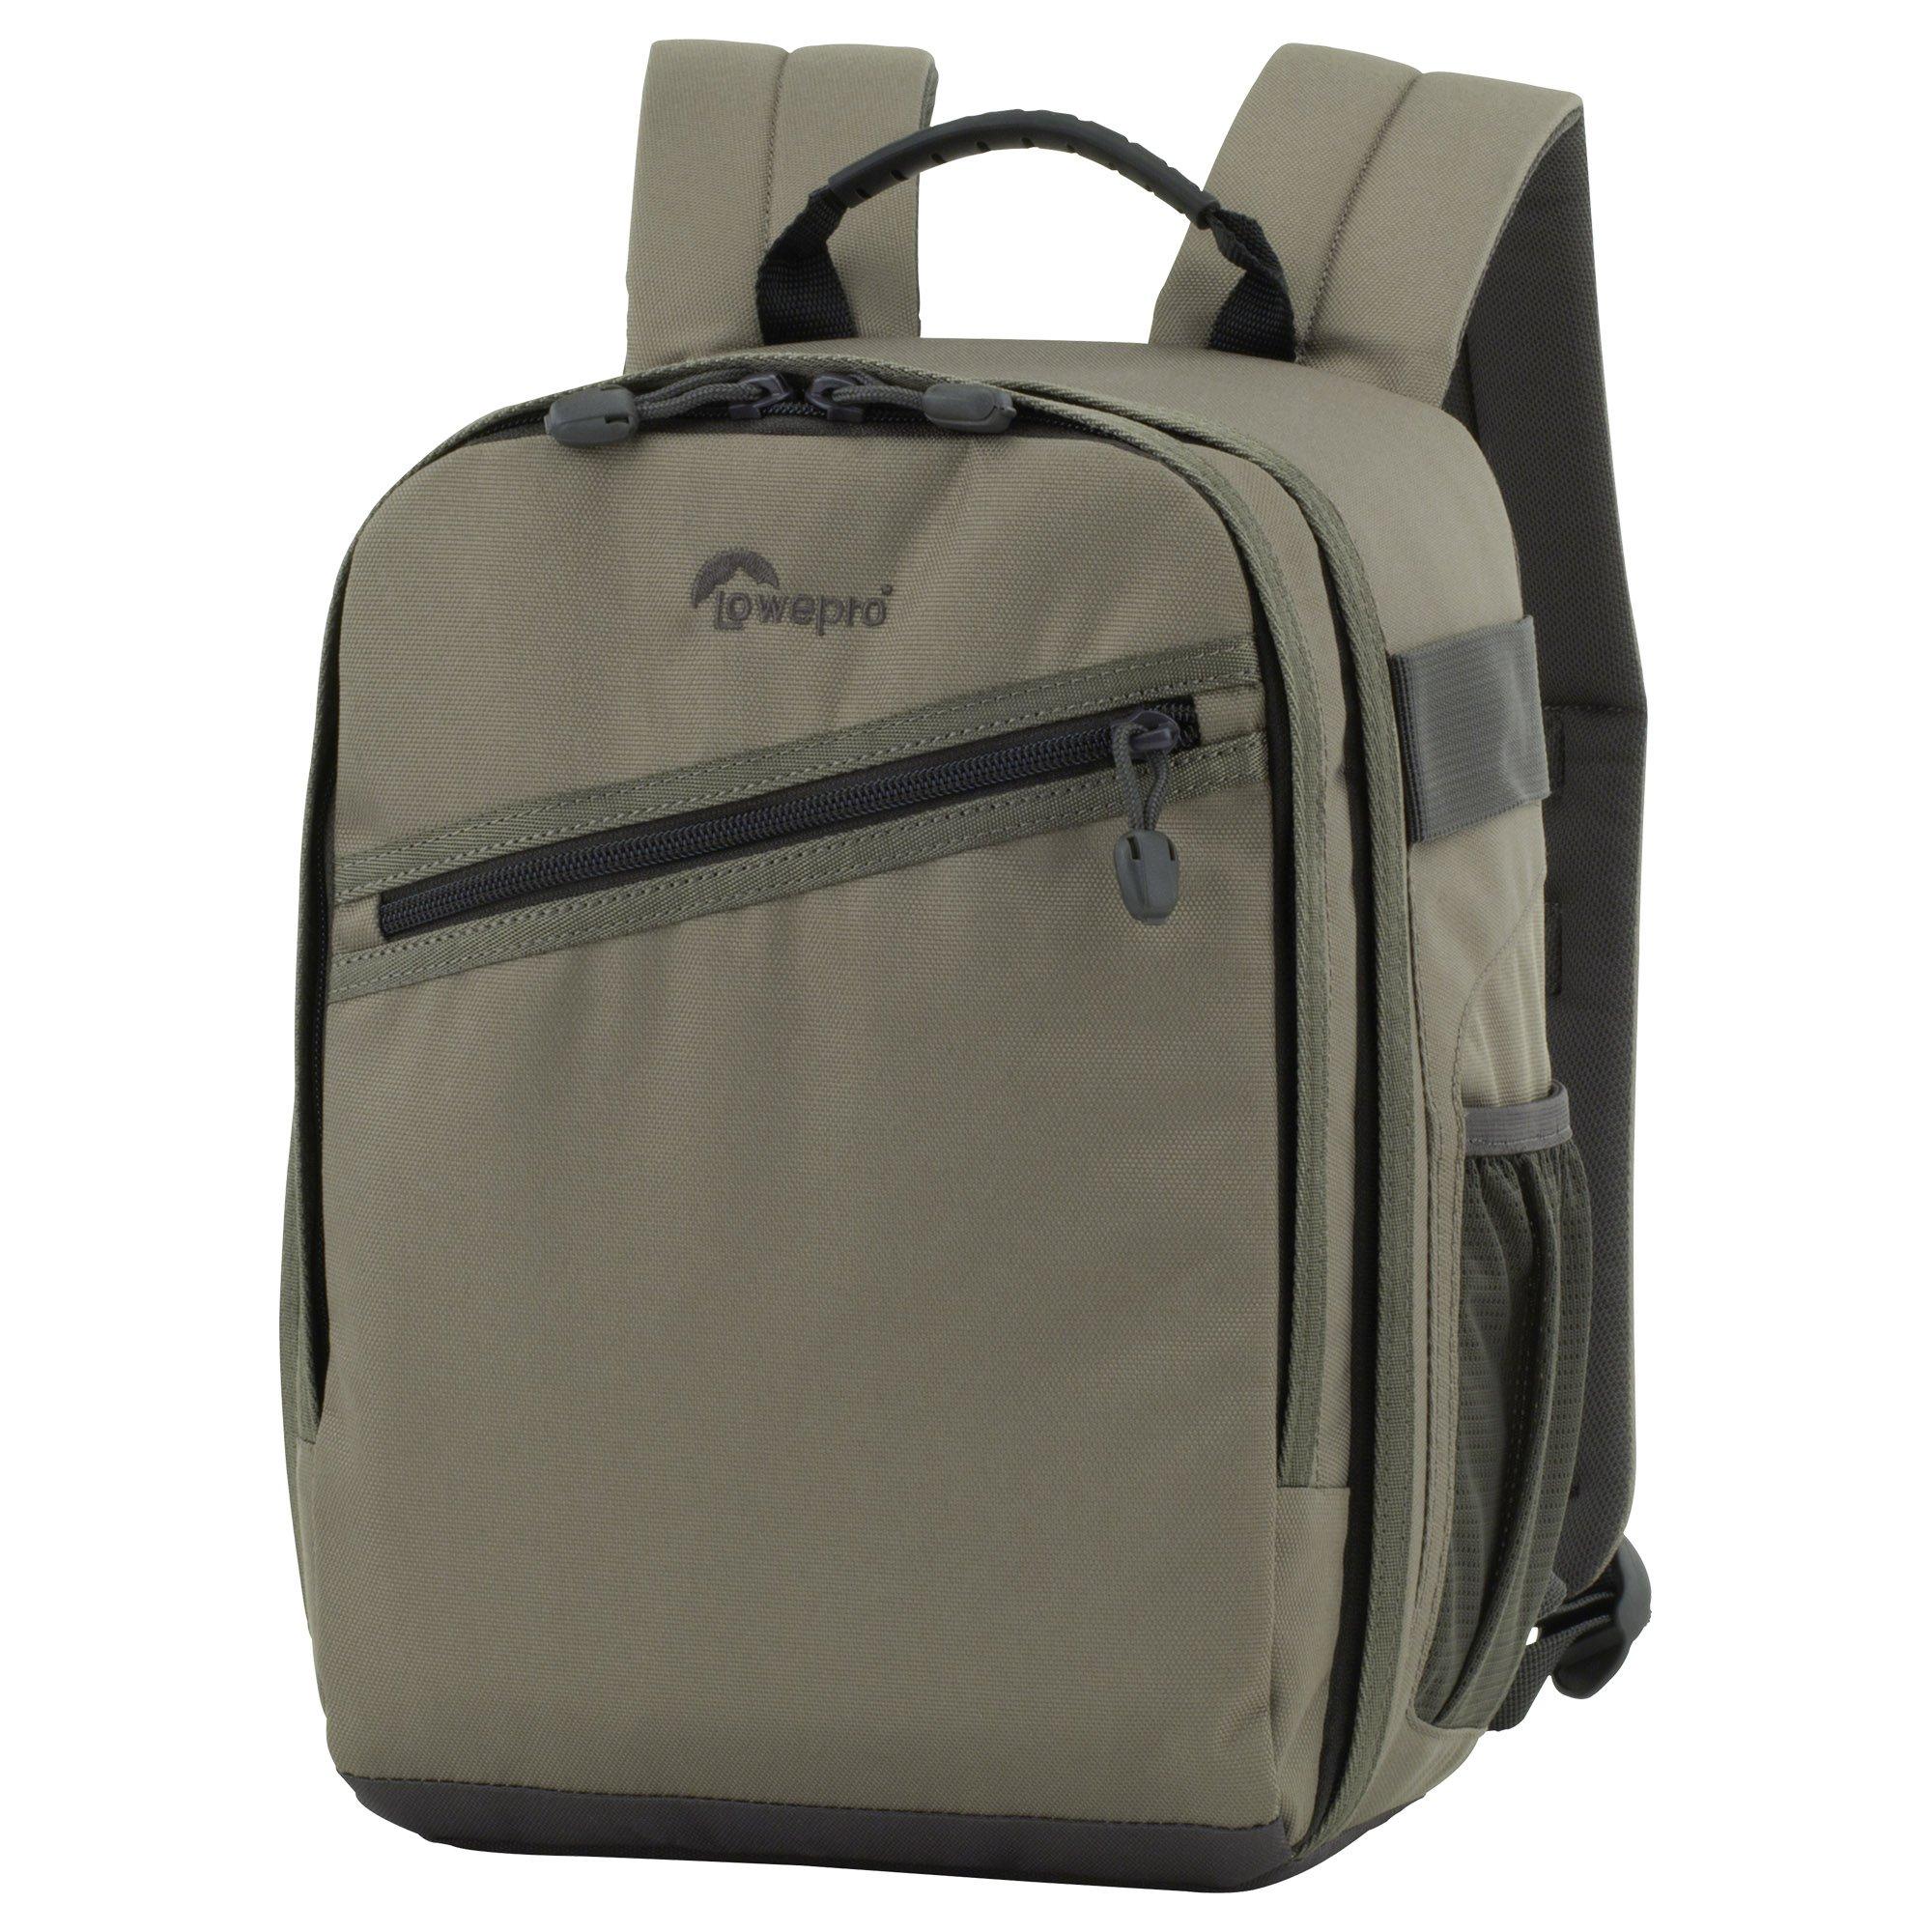 Lowepro Photo Traveler 150 Backpack for DSLR or Mirrorless Camera